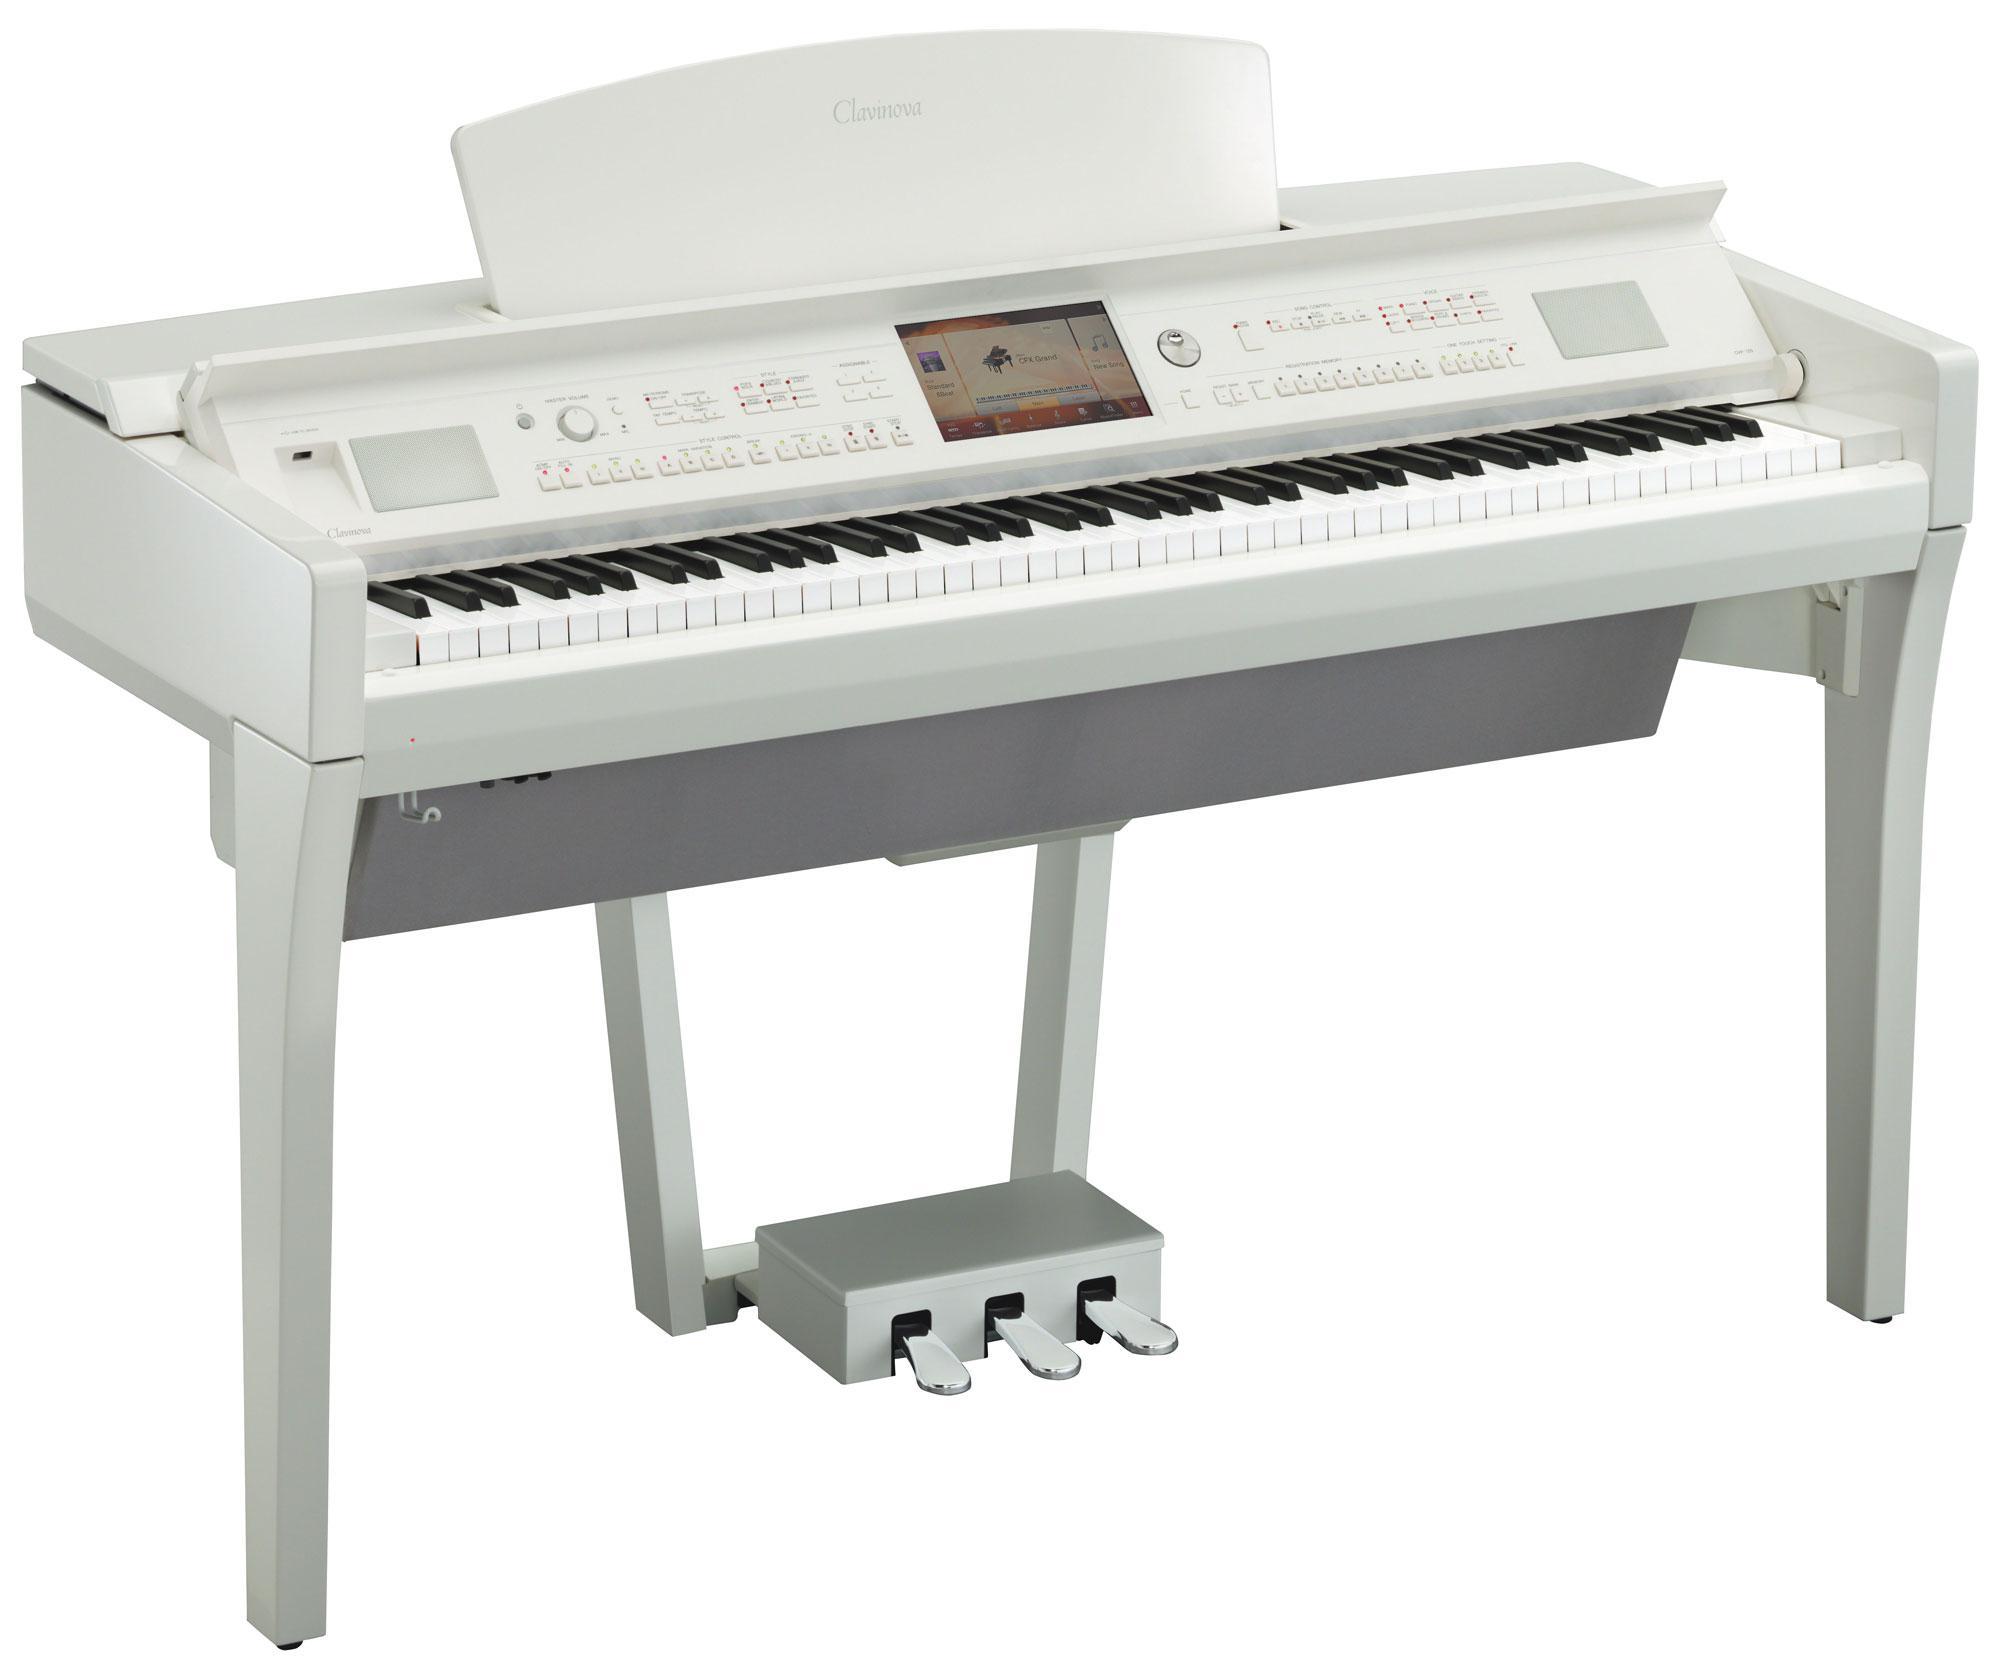 Yamaha cvp 709 pwh clavinova digitalpiano wei hochglanz for Yamaha cvp 709